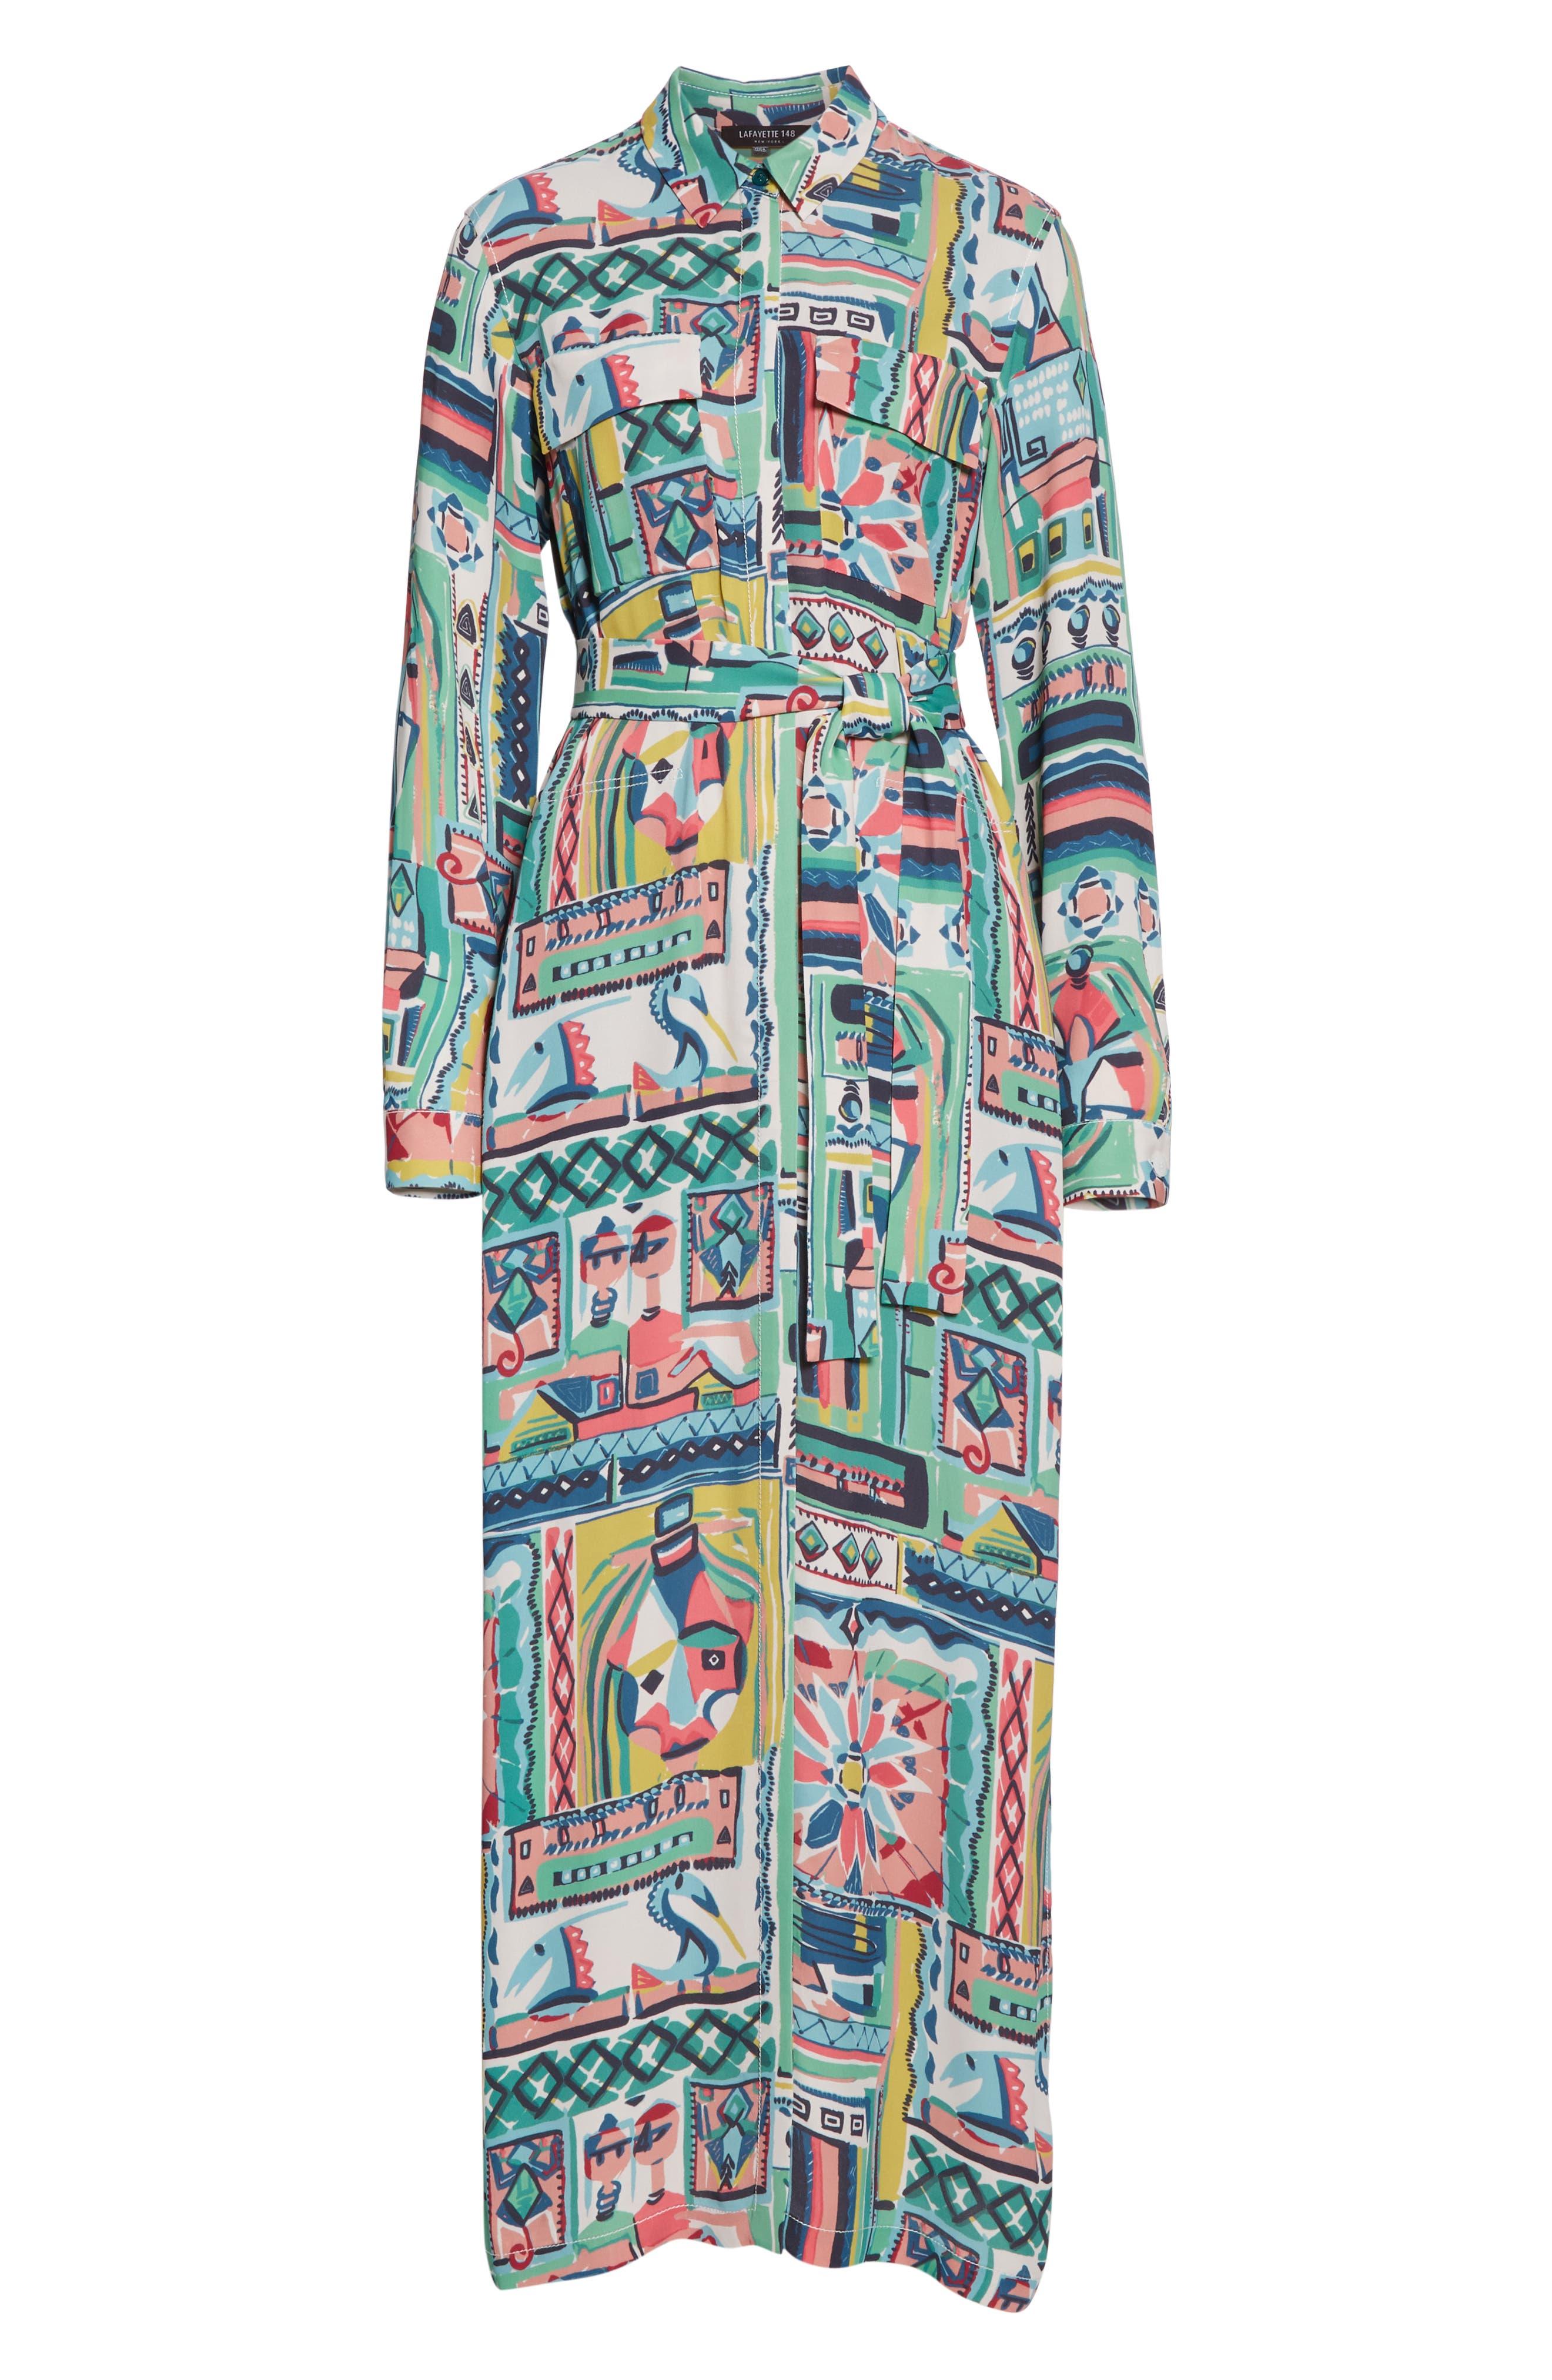 LAFAYETTE 148 NEW YORK, Doha Palazzo Patchwork Print Maxi Shirtdress, Alternate thumbnail 6, color, 400